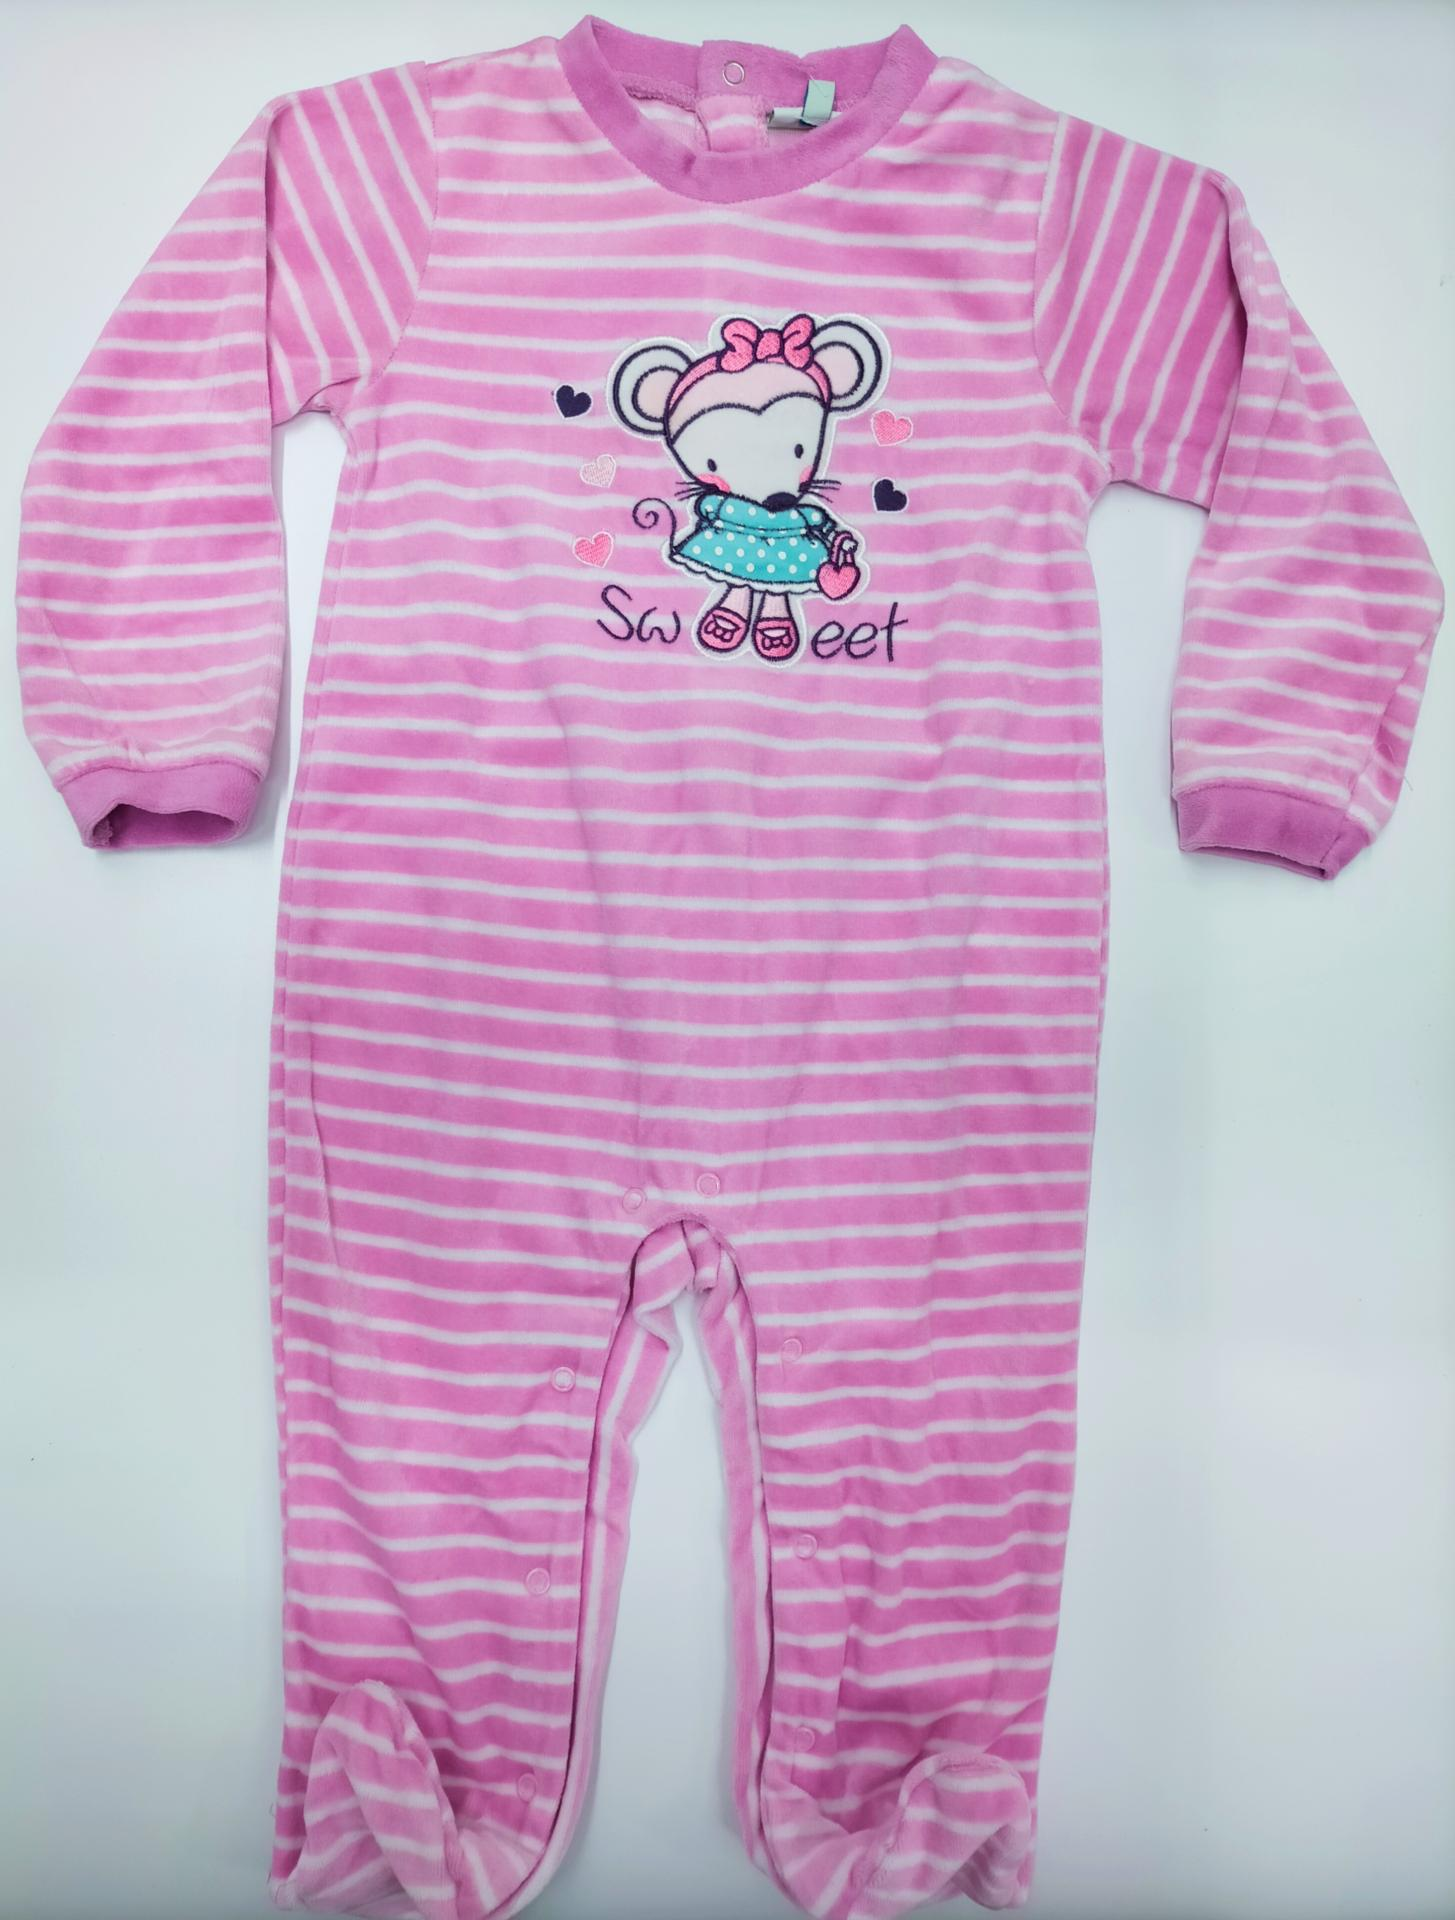 Pijama bebé  rosa Ratita Sweet  de Yatsi.